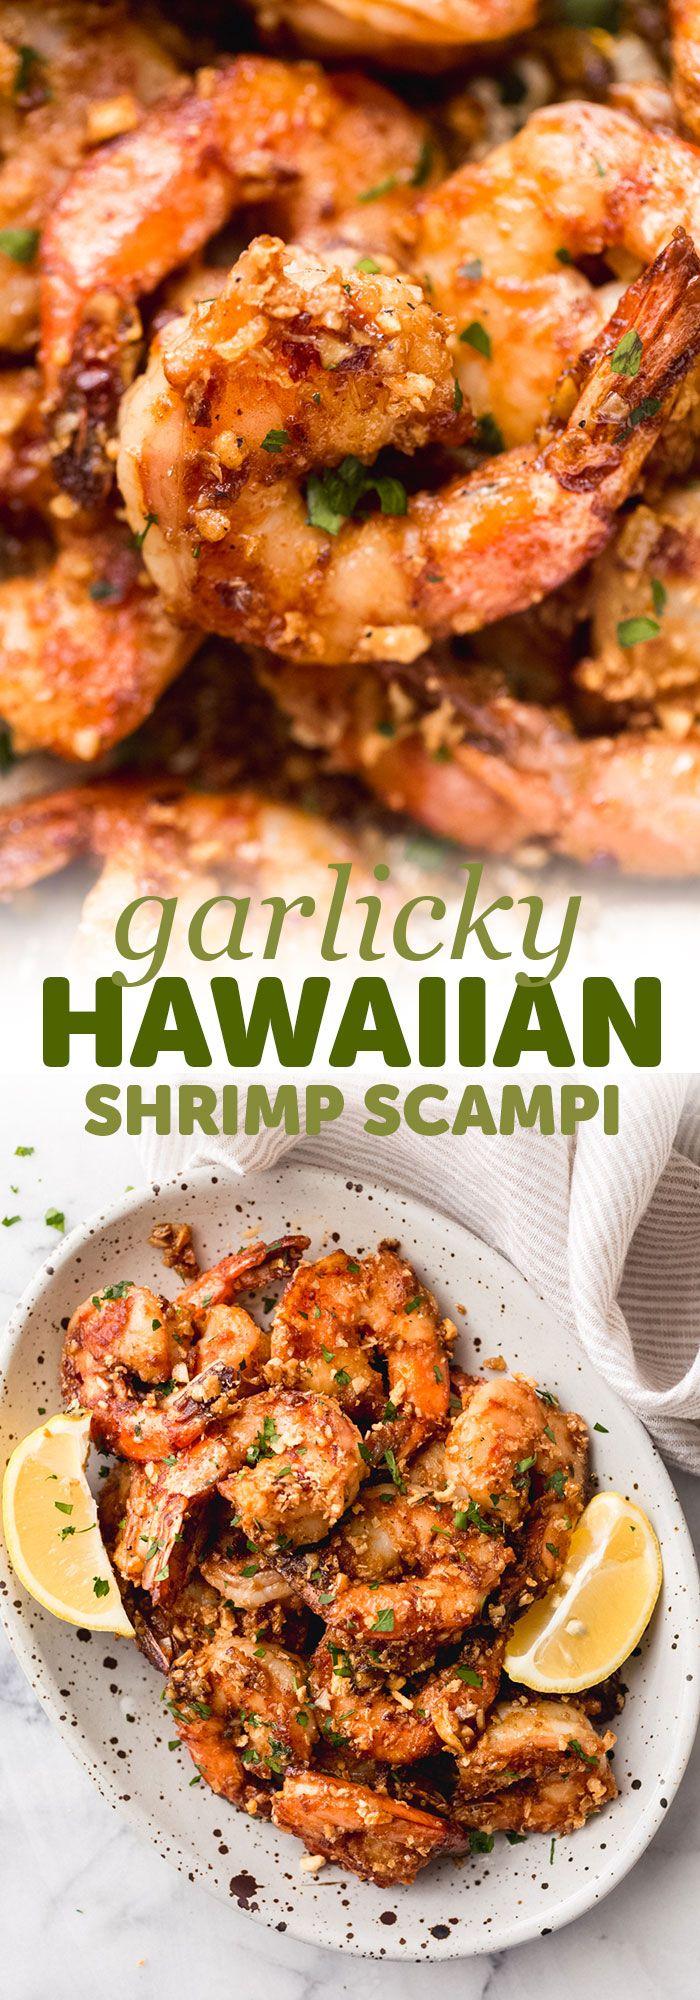 Garlicky Hawaiian Shrimp Scampi #shrimpscampi